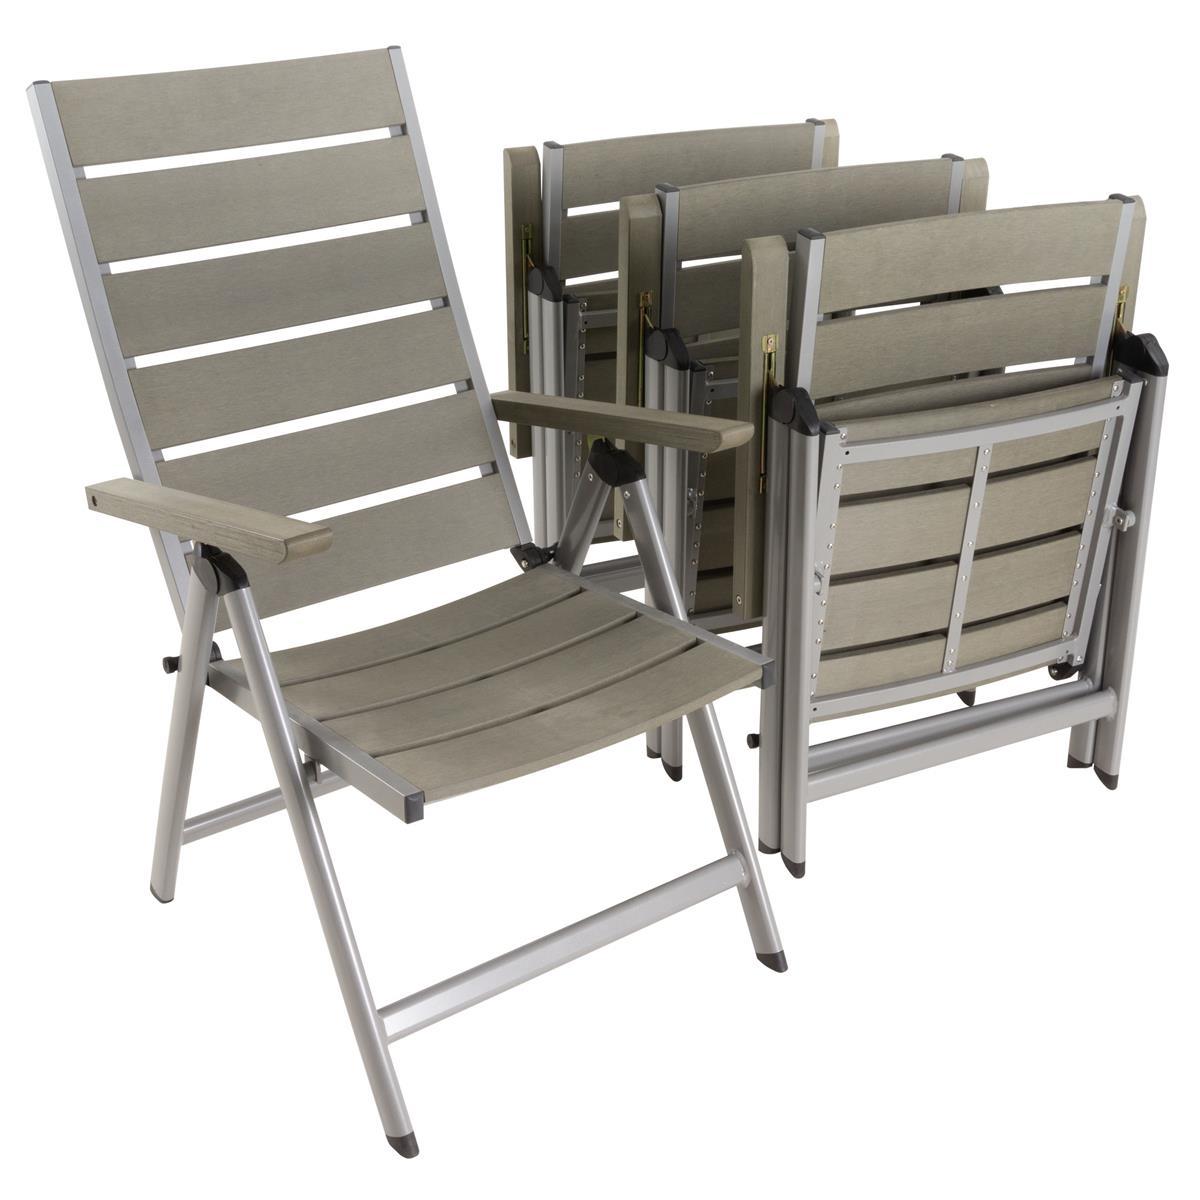 4er Set Gartenstuhl Klappstuhl grau Aluminium Polywood Hochlehner Gartenmöbel